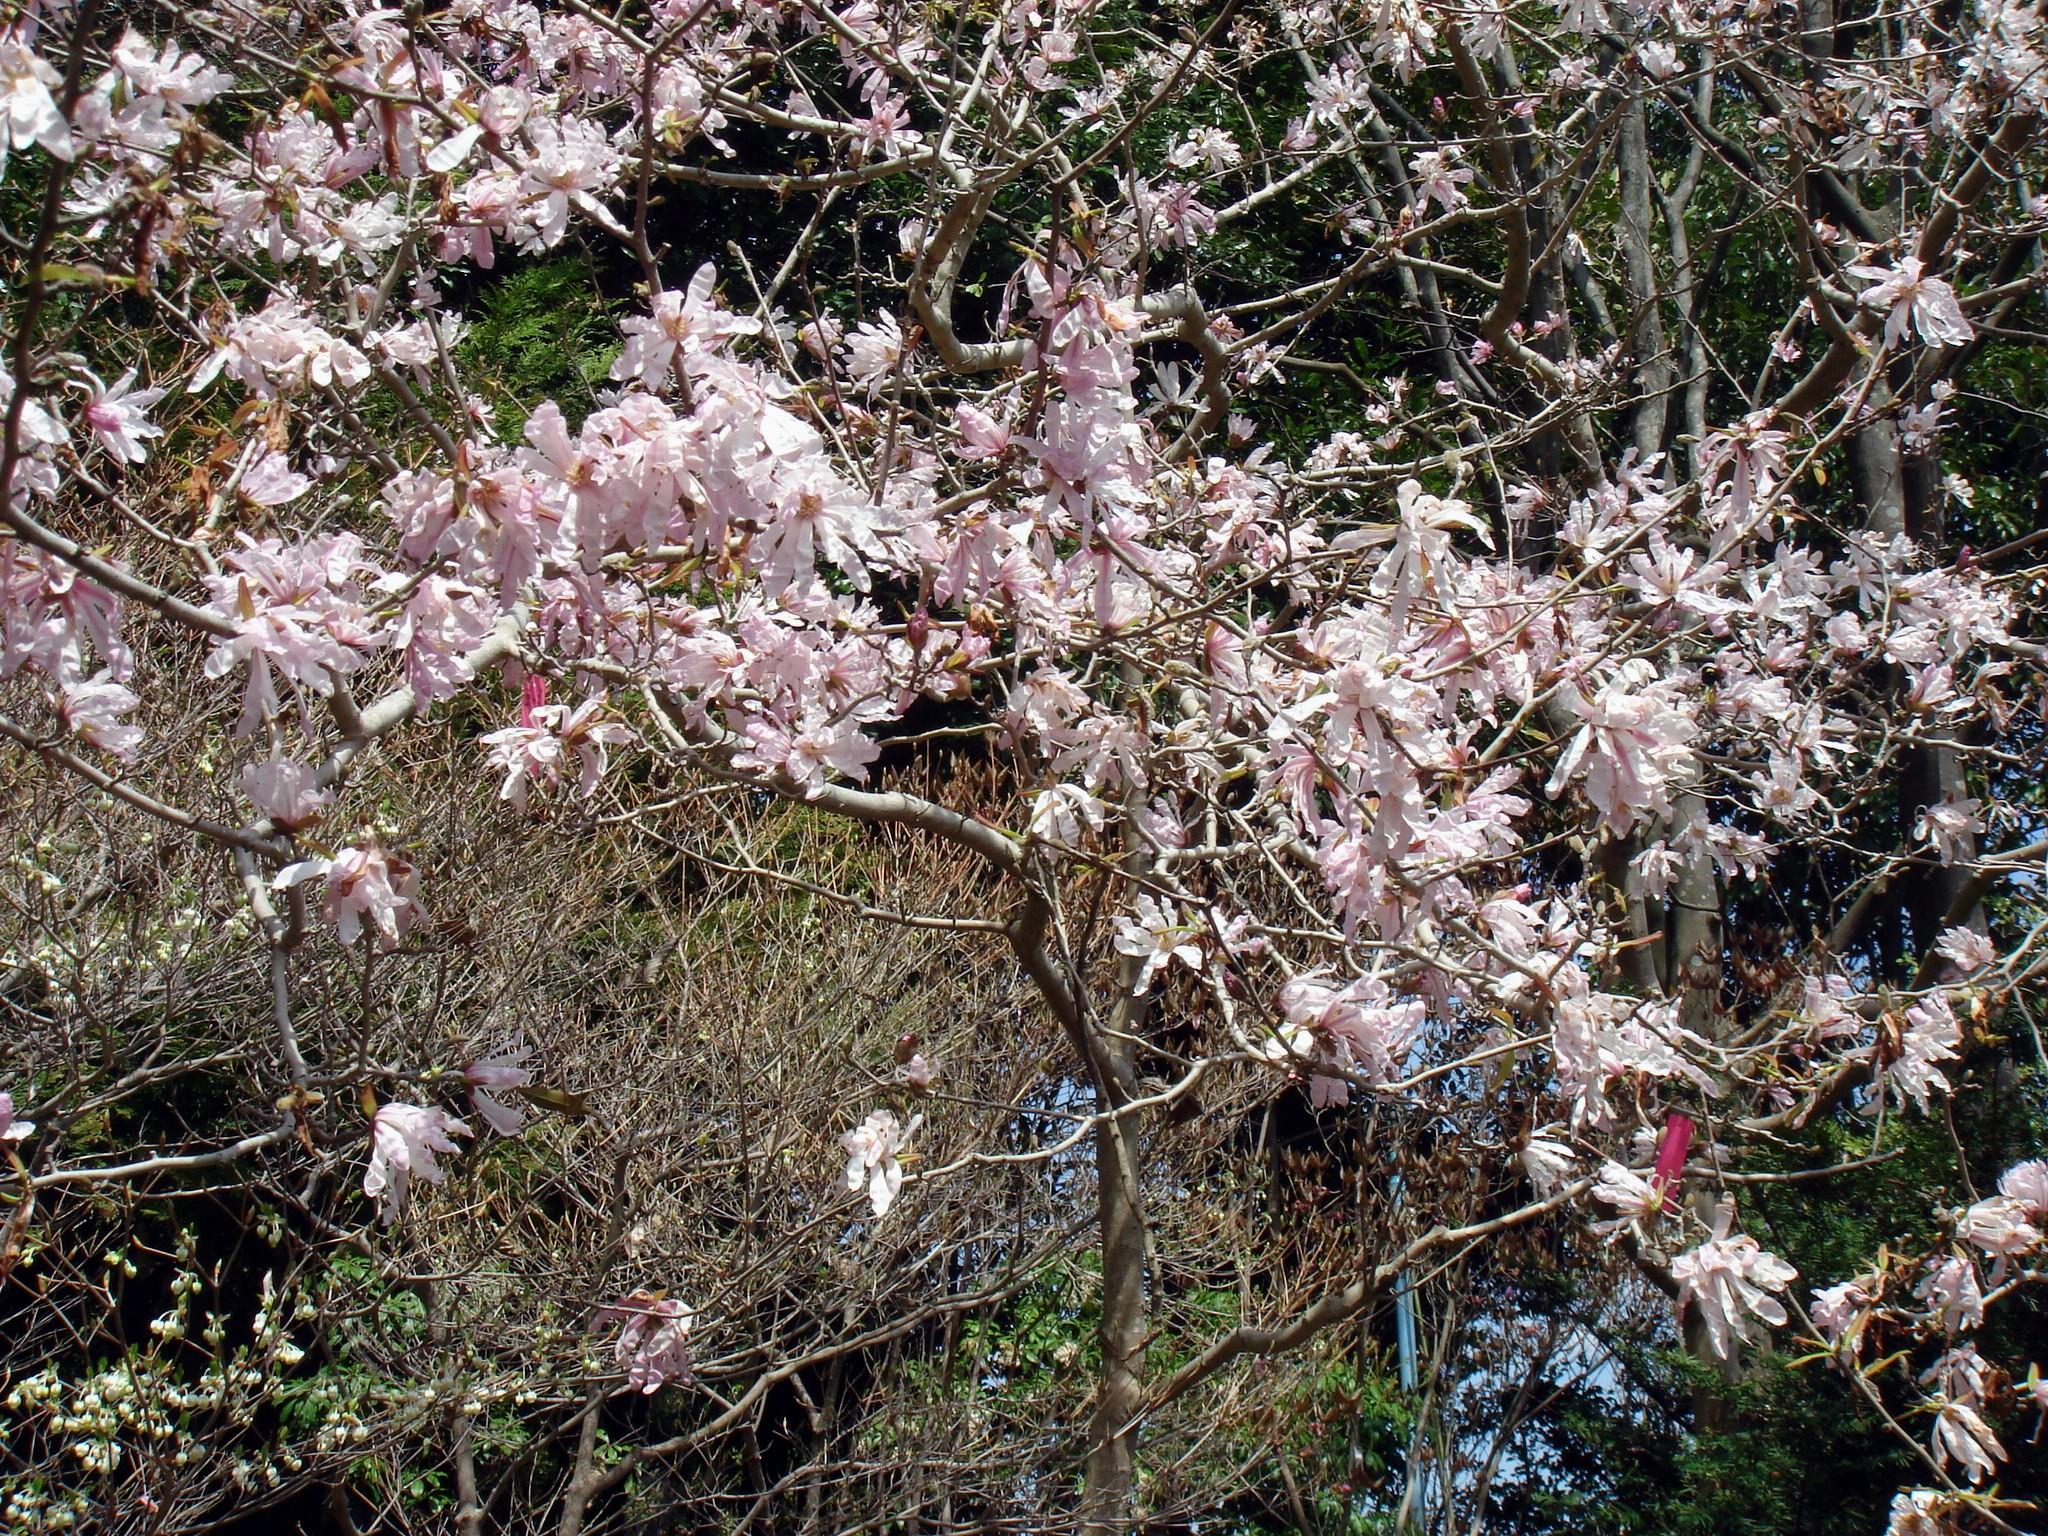 magnolia stellata siebold zuccarini maximowicz var keiskei makino. Black Bedroom Furniture Sets. Home Design Ideas